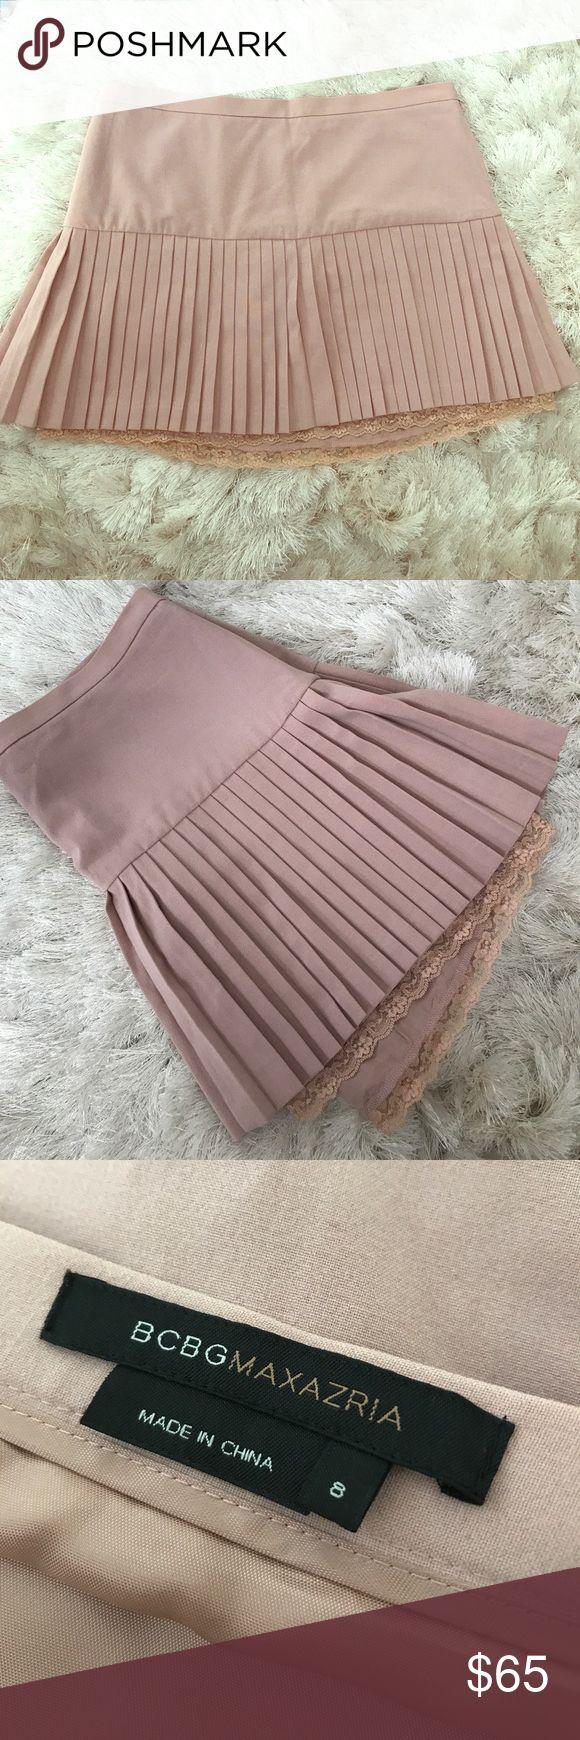 BCBG Pleated Skirt Blush Pleated mini skirt with lace trim. Never worn! BCBGMaxAzria Skirts Mini